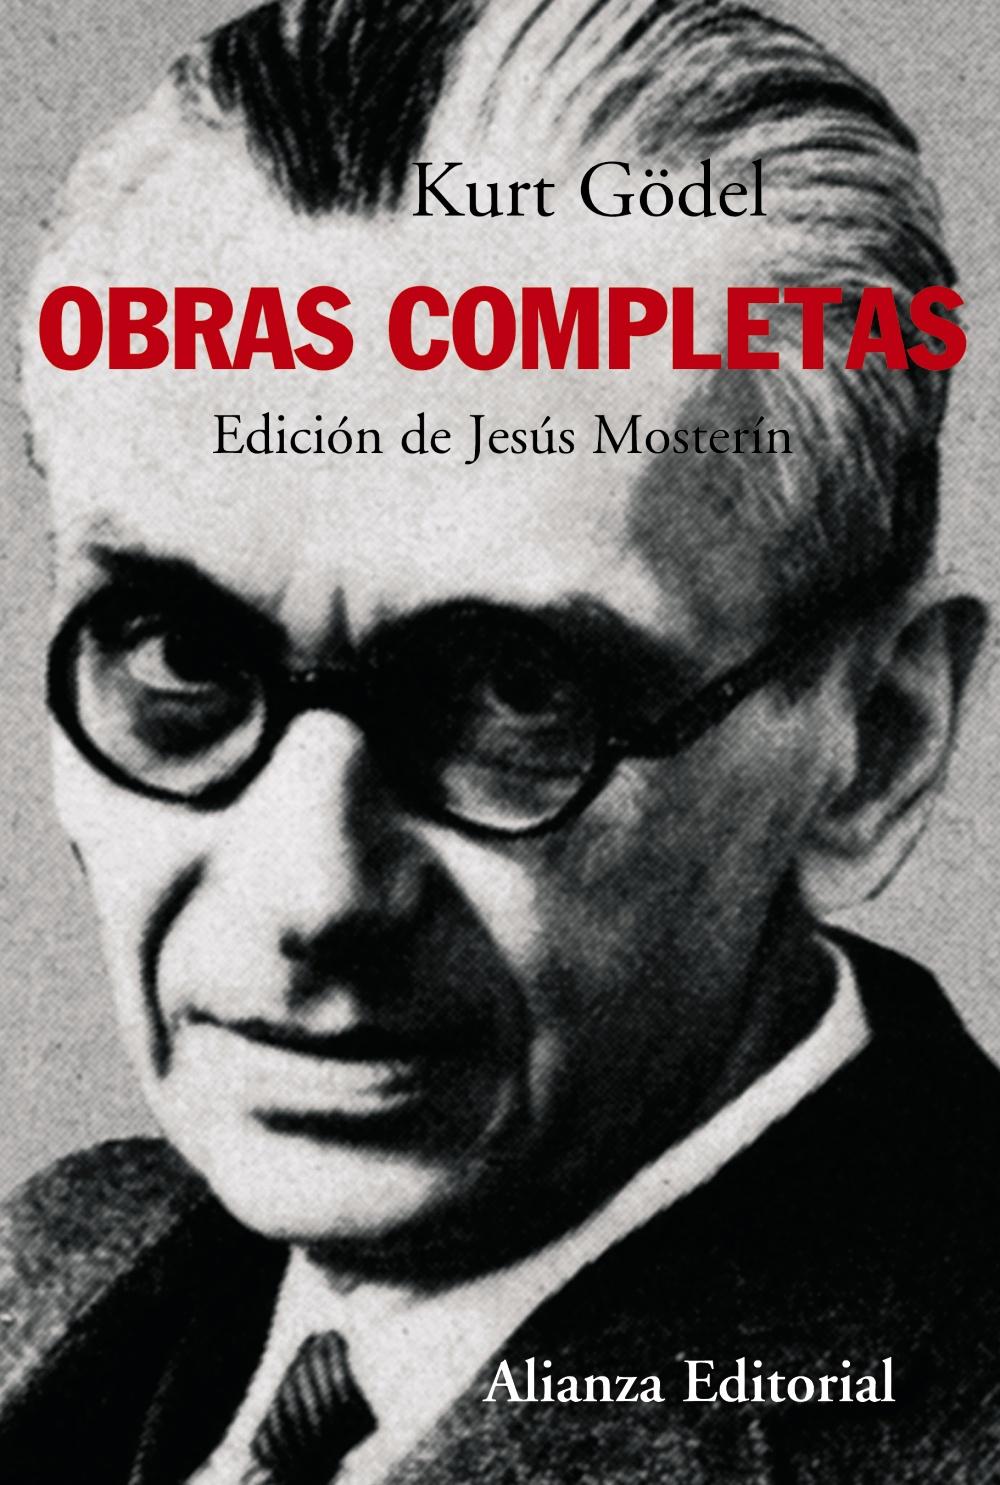 Kurt Gödel: Obras Completas por Jesus Mosterin